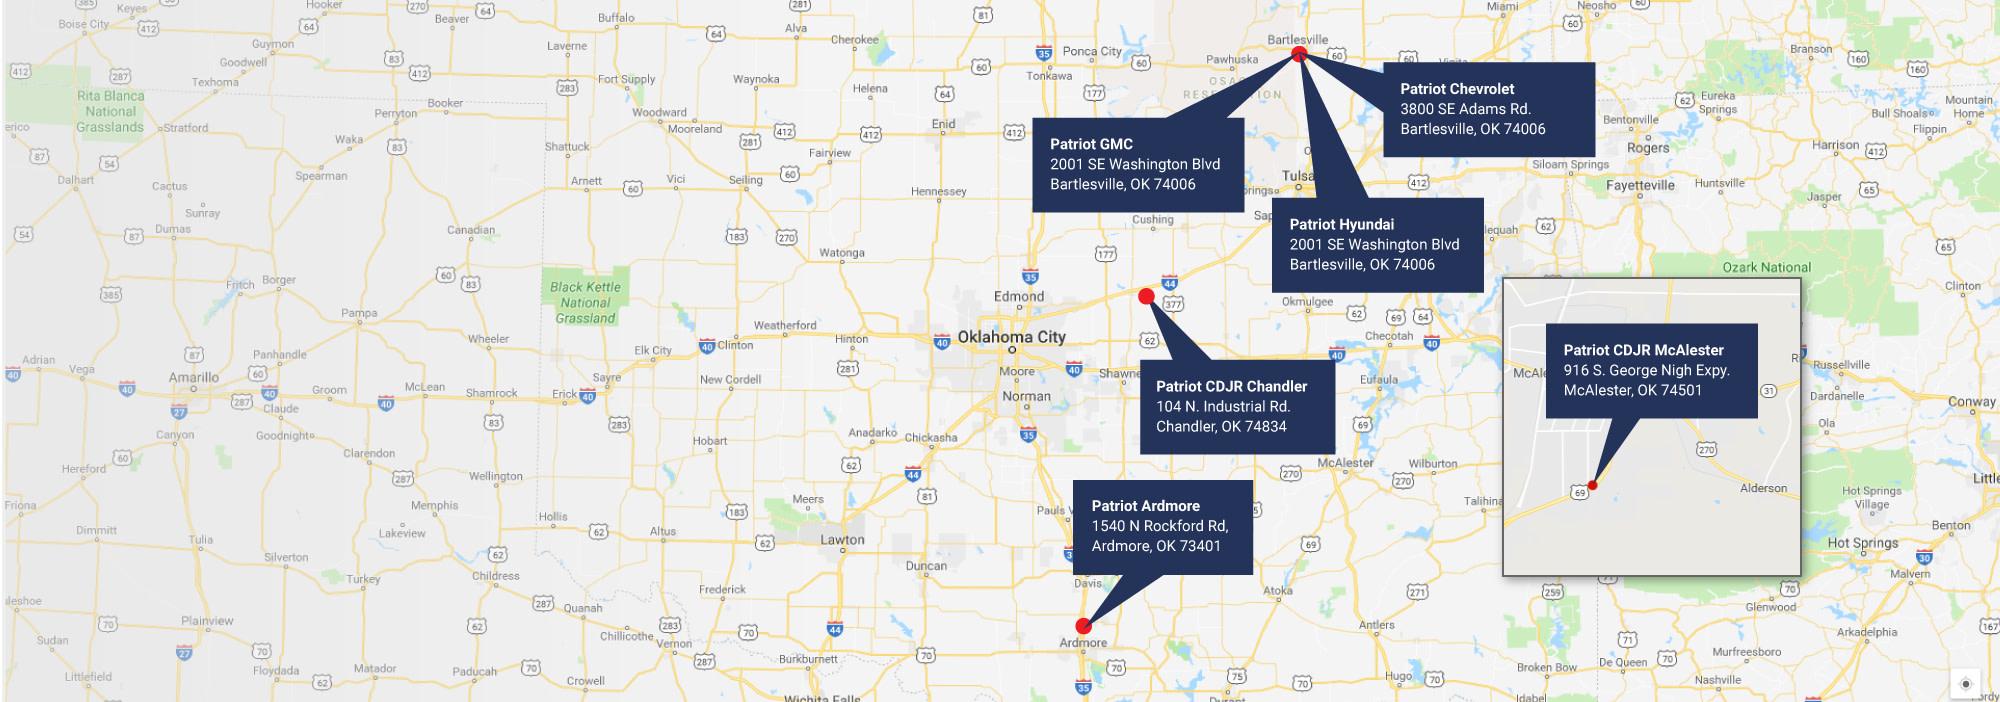 Patriot Auto Group Locations